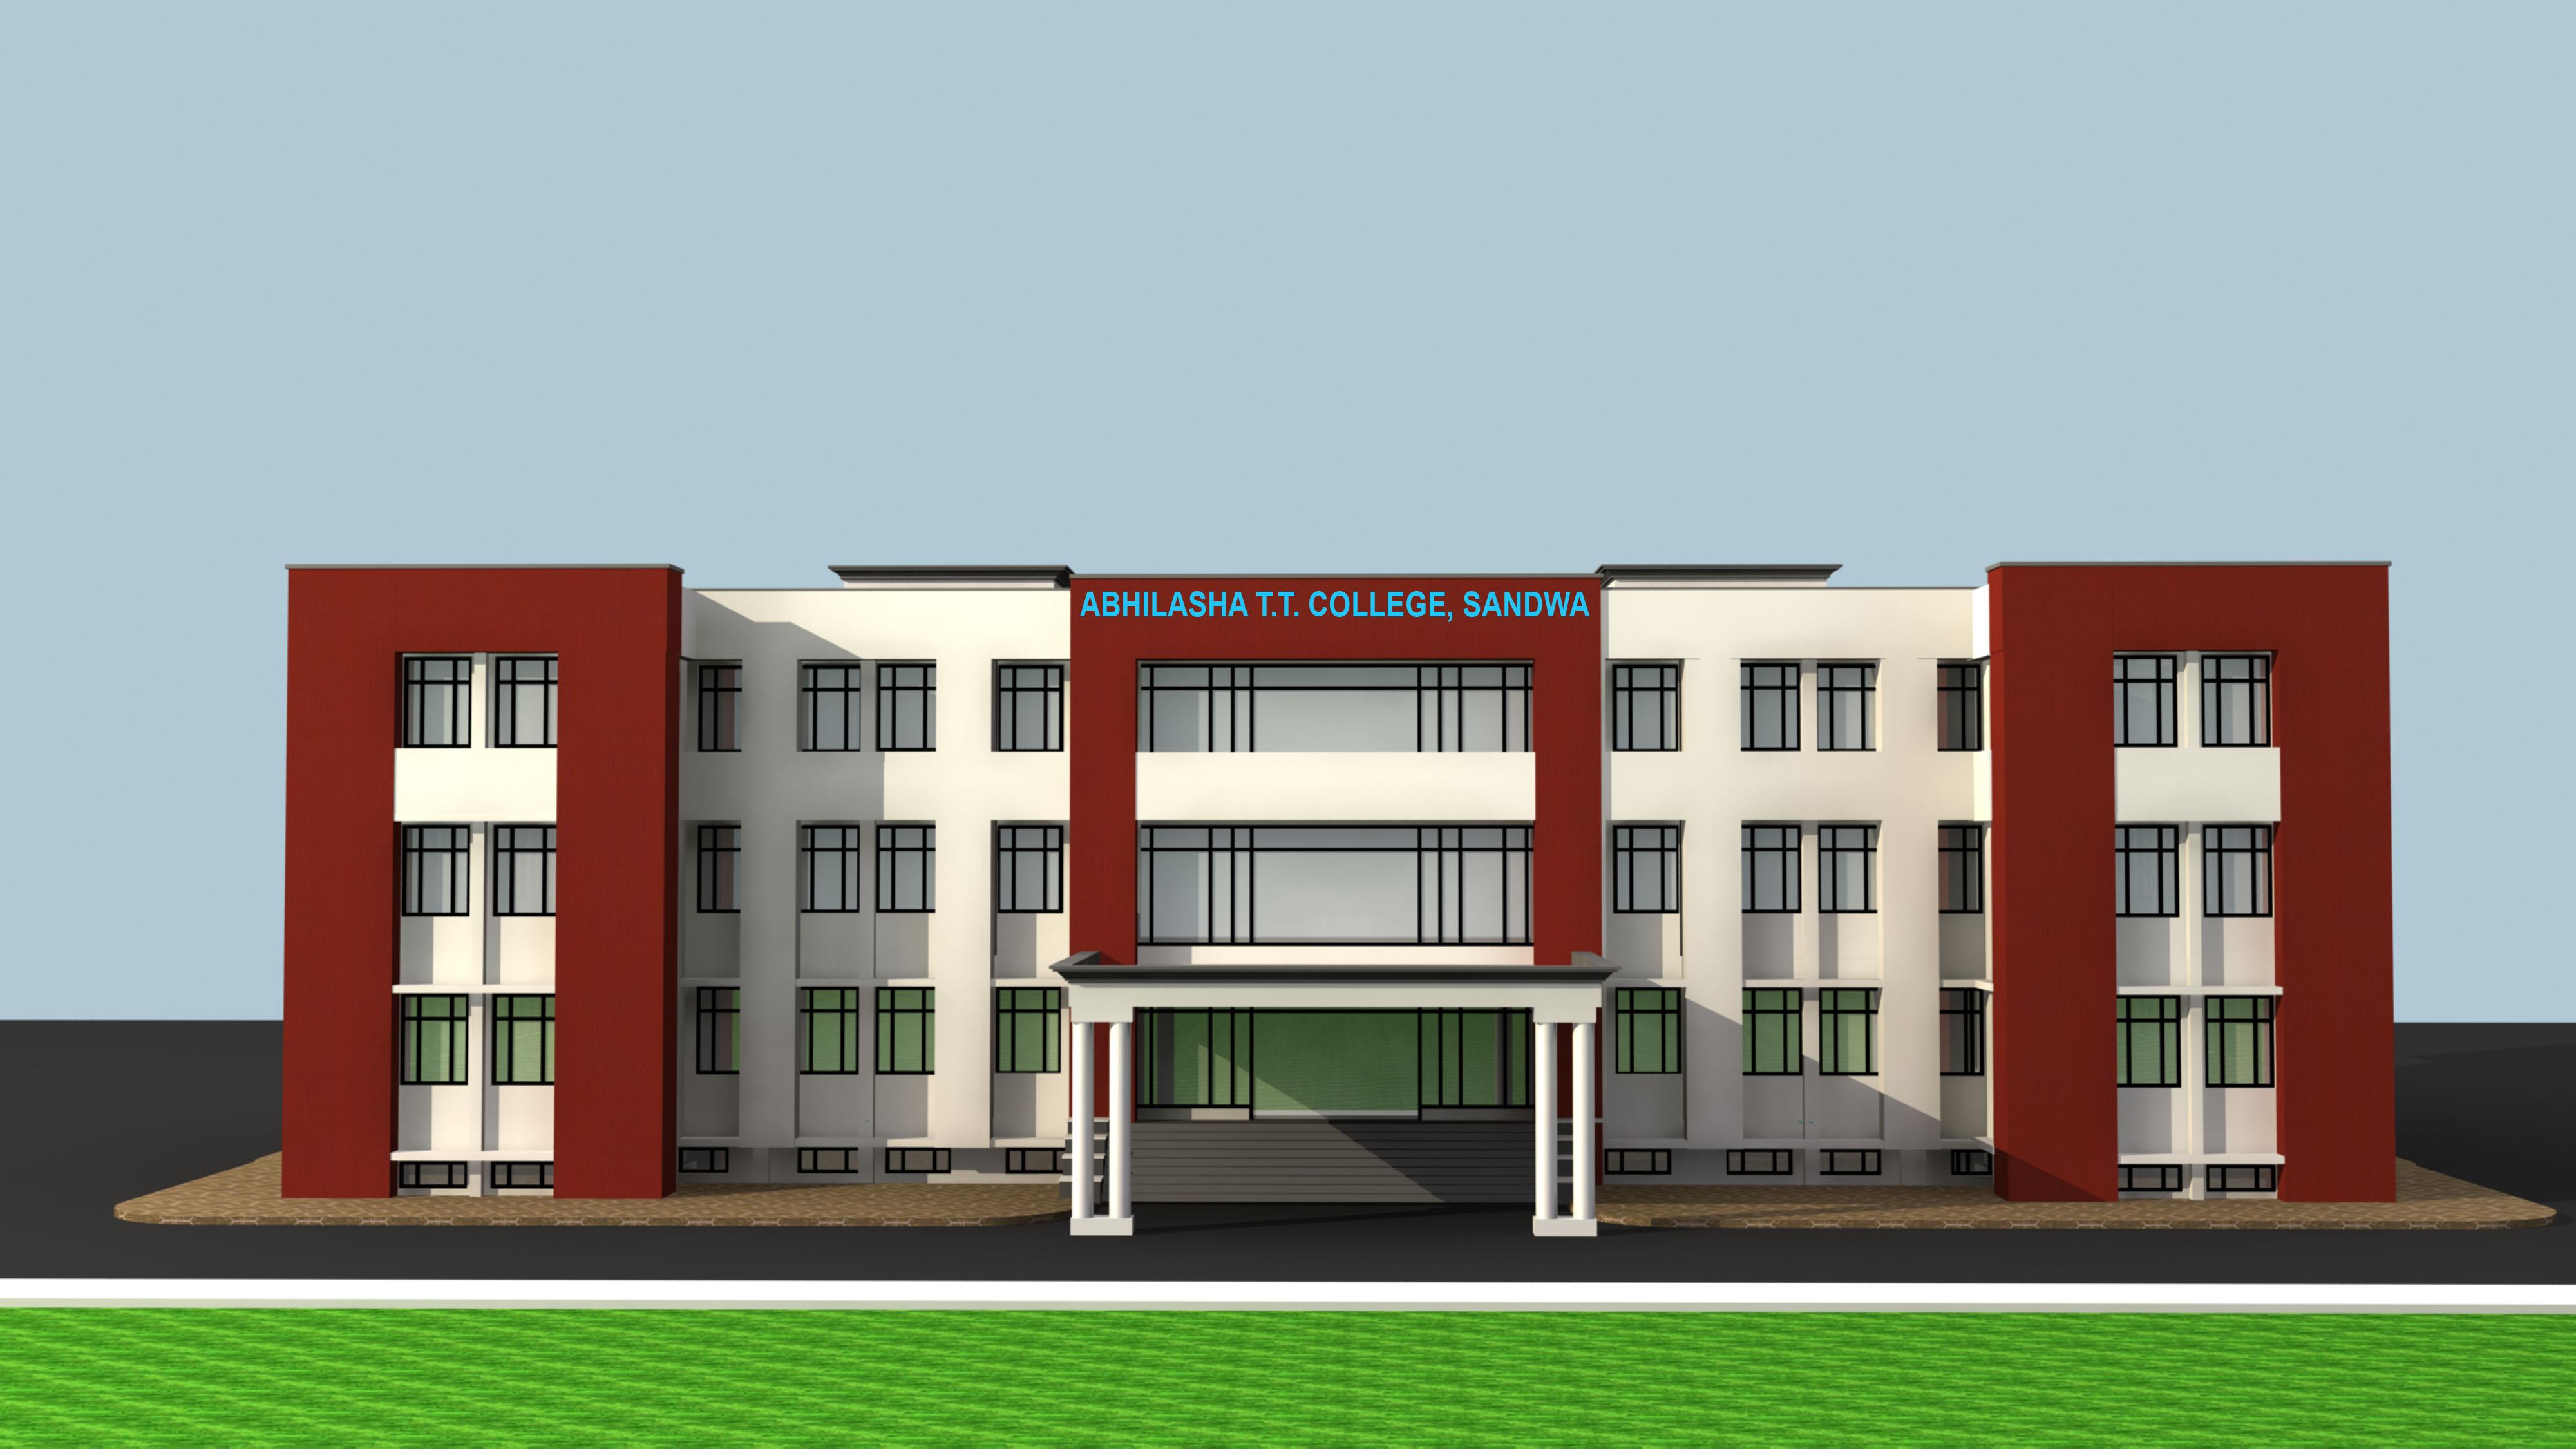 Abhilasha Teacher Training College, Sandwa Image